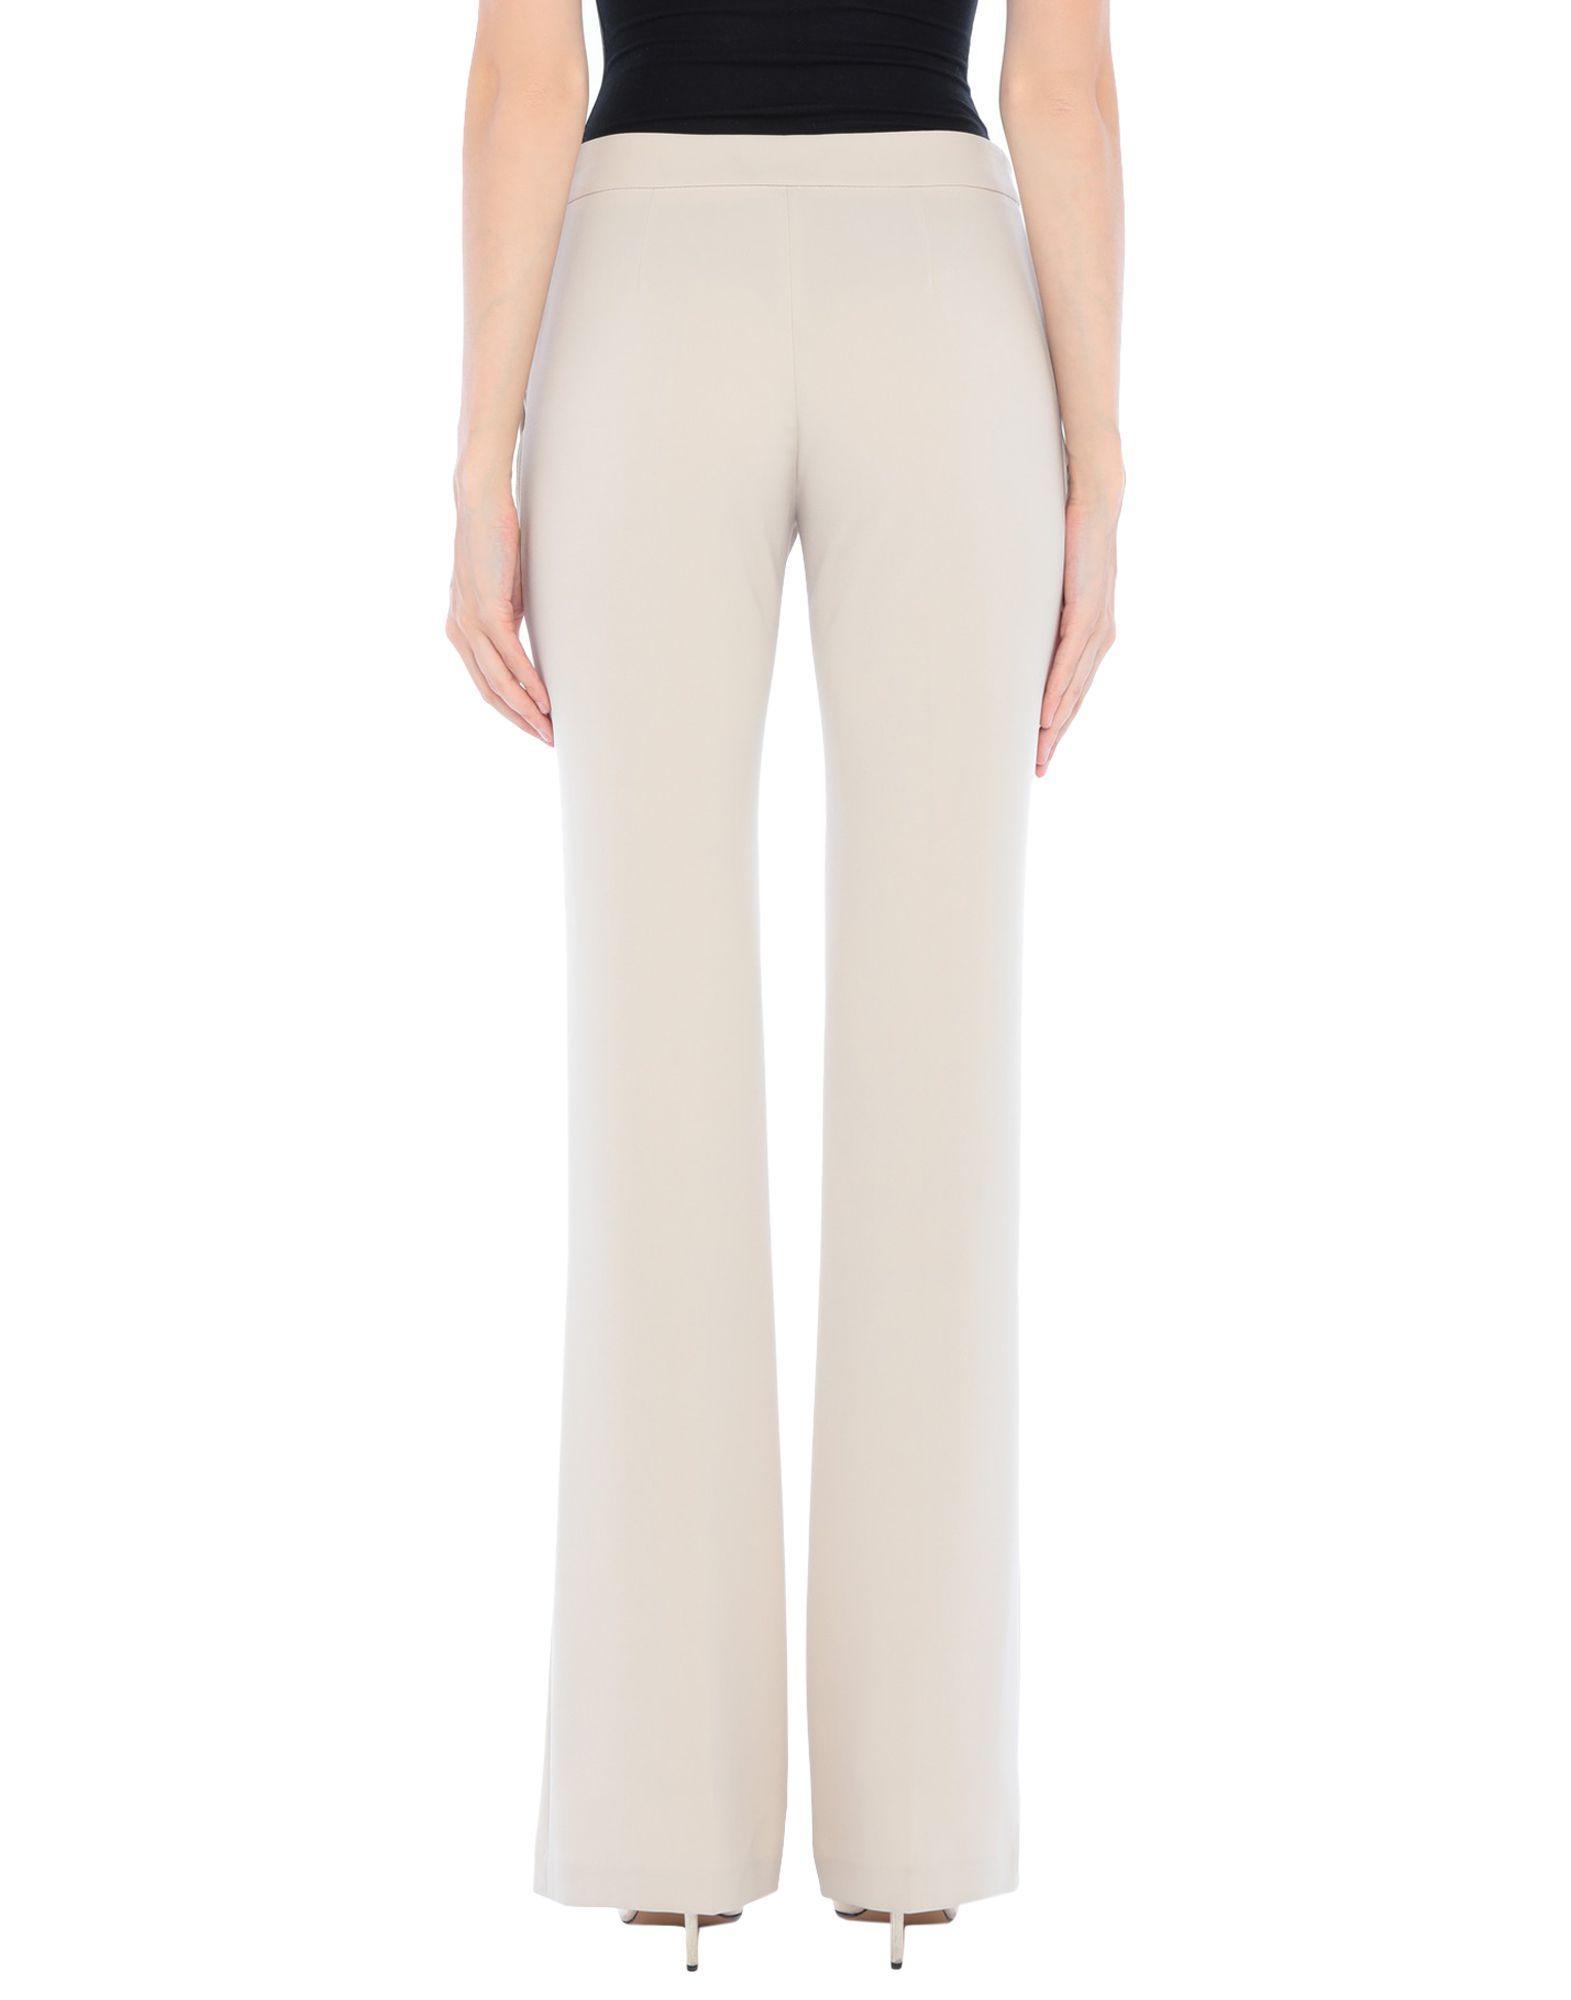 Elisabetta Franchi Beige Crepe Tailored Trousers